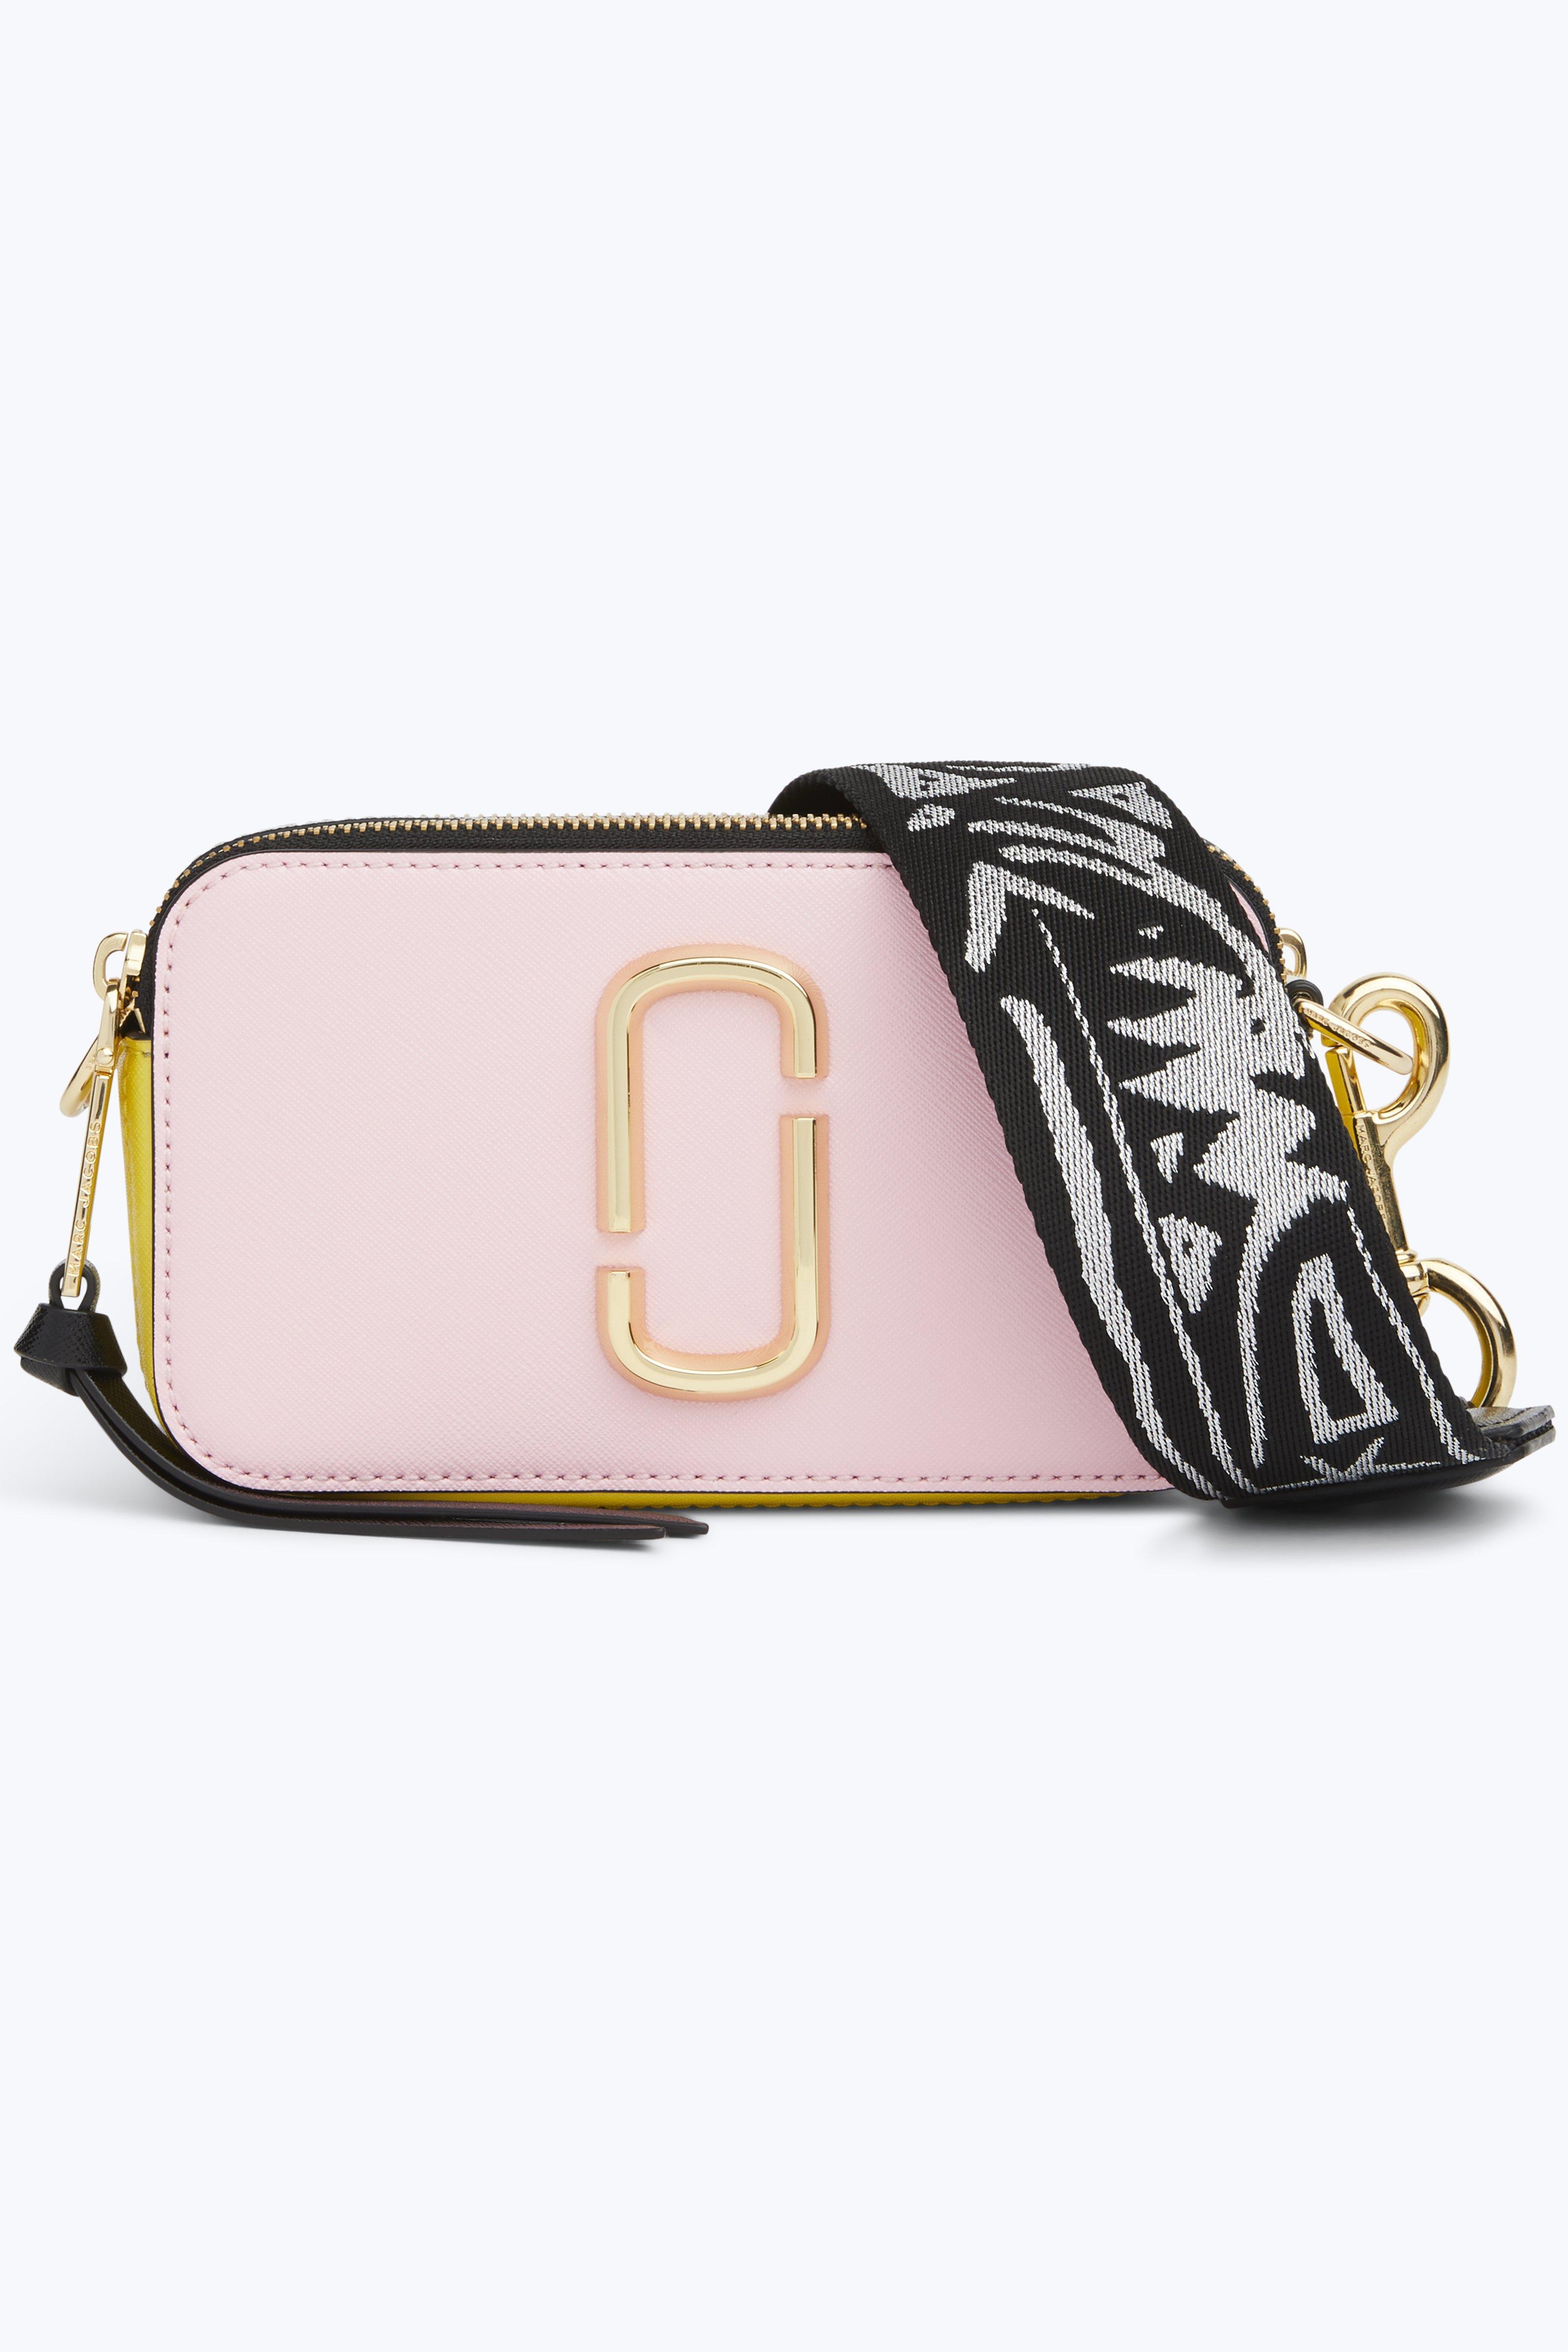 41c3172ce782 Lyst - Marc Jacobs Snapshot Crossbody Bag In Multicolor Polyurethane ...